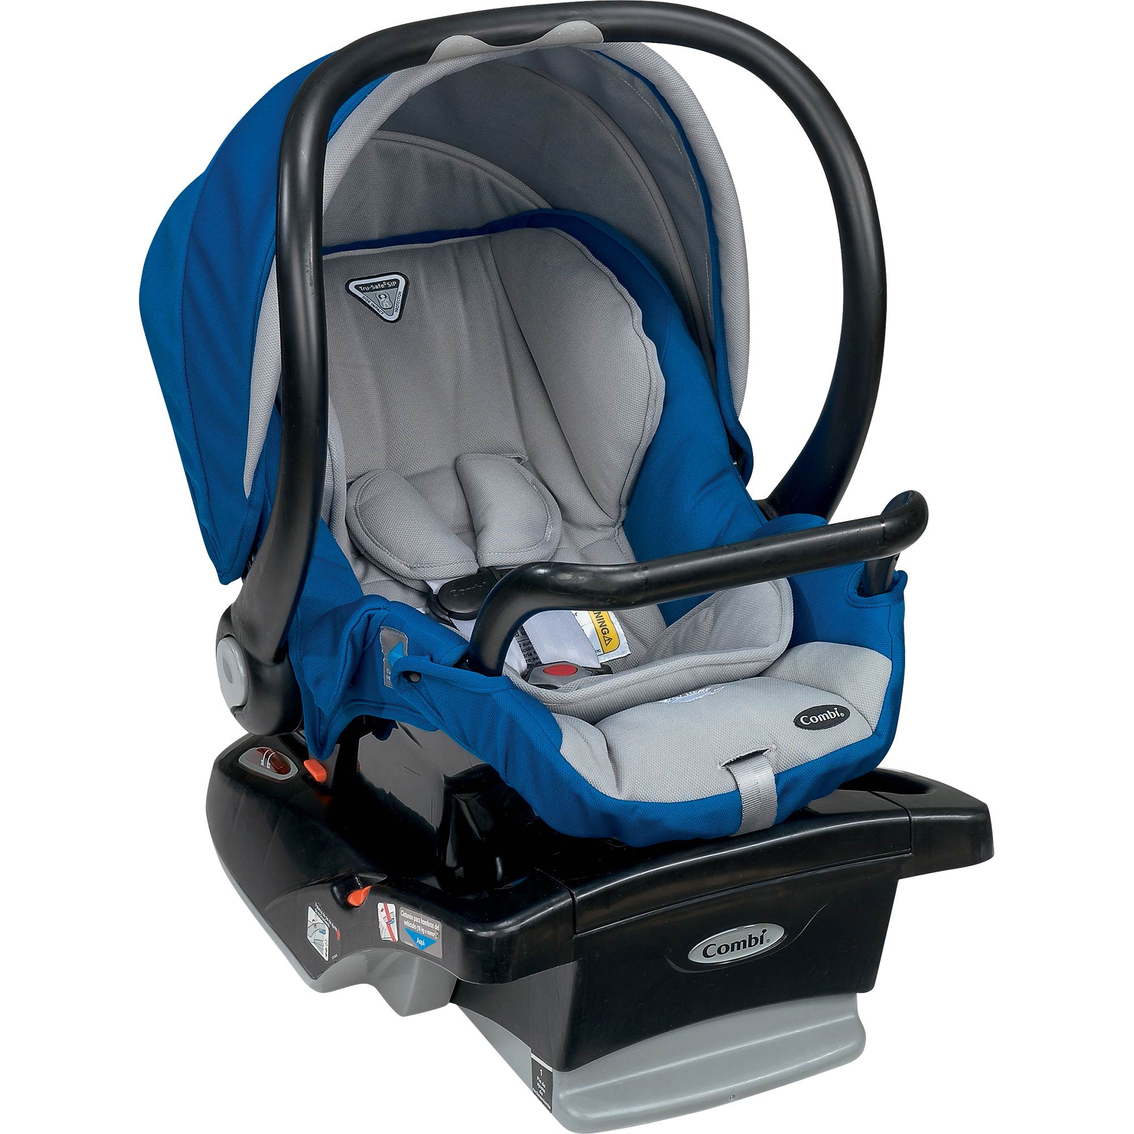 combi shuttle infant car seat infant seats baby toys shop the exchange. Black Bedroom Furniture Sets. Home Design Ideas